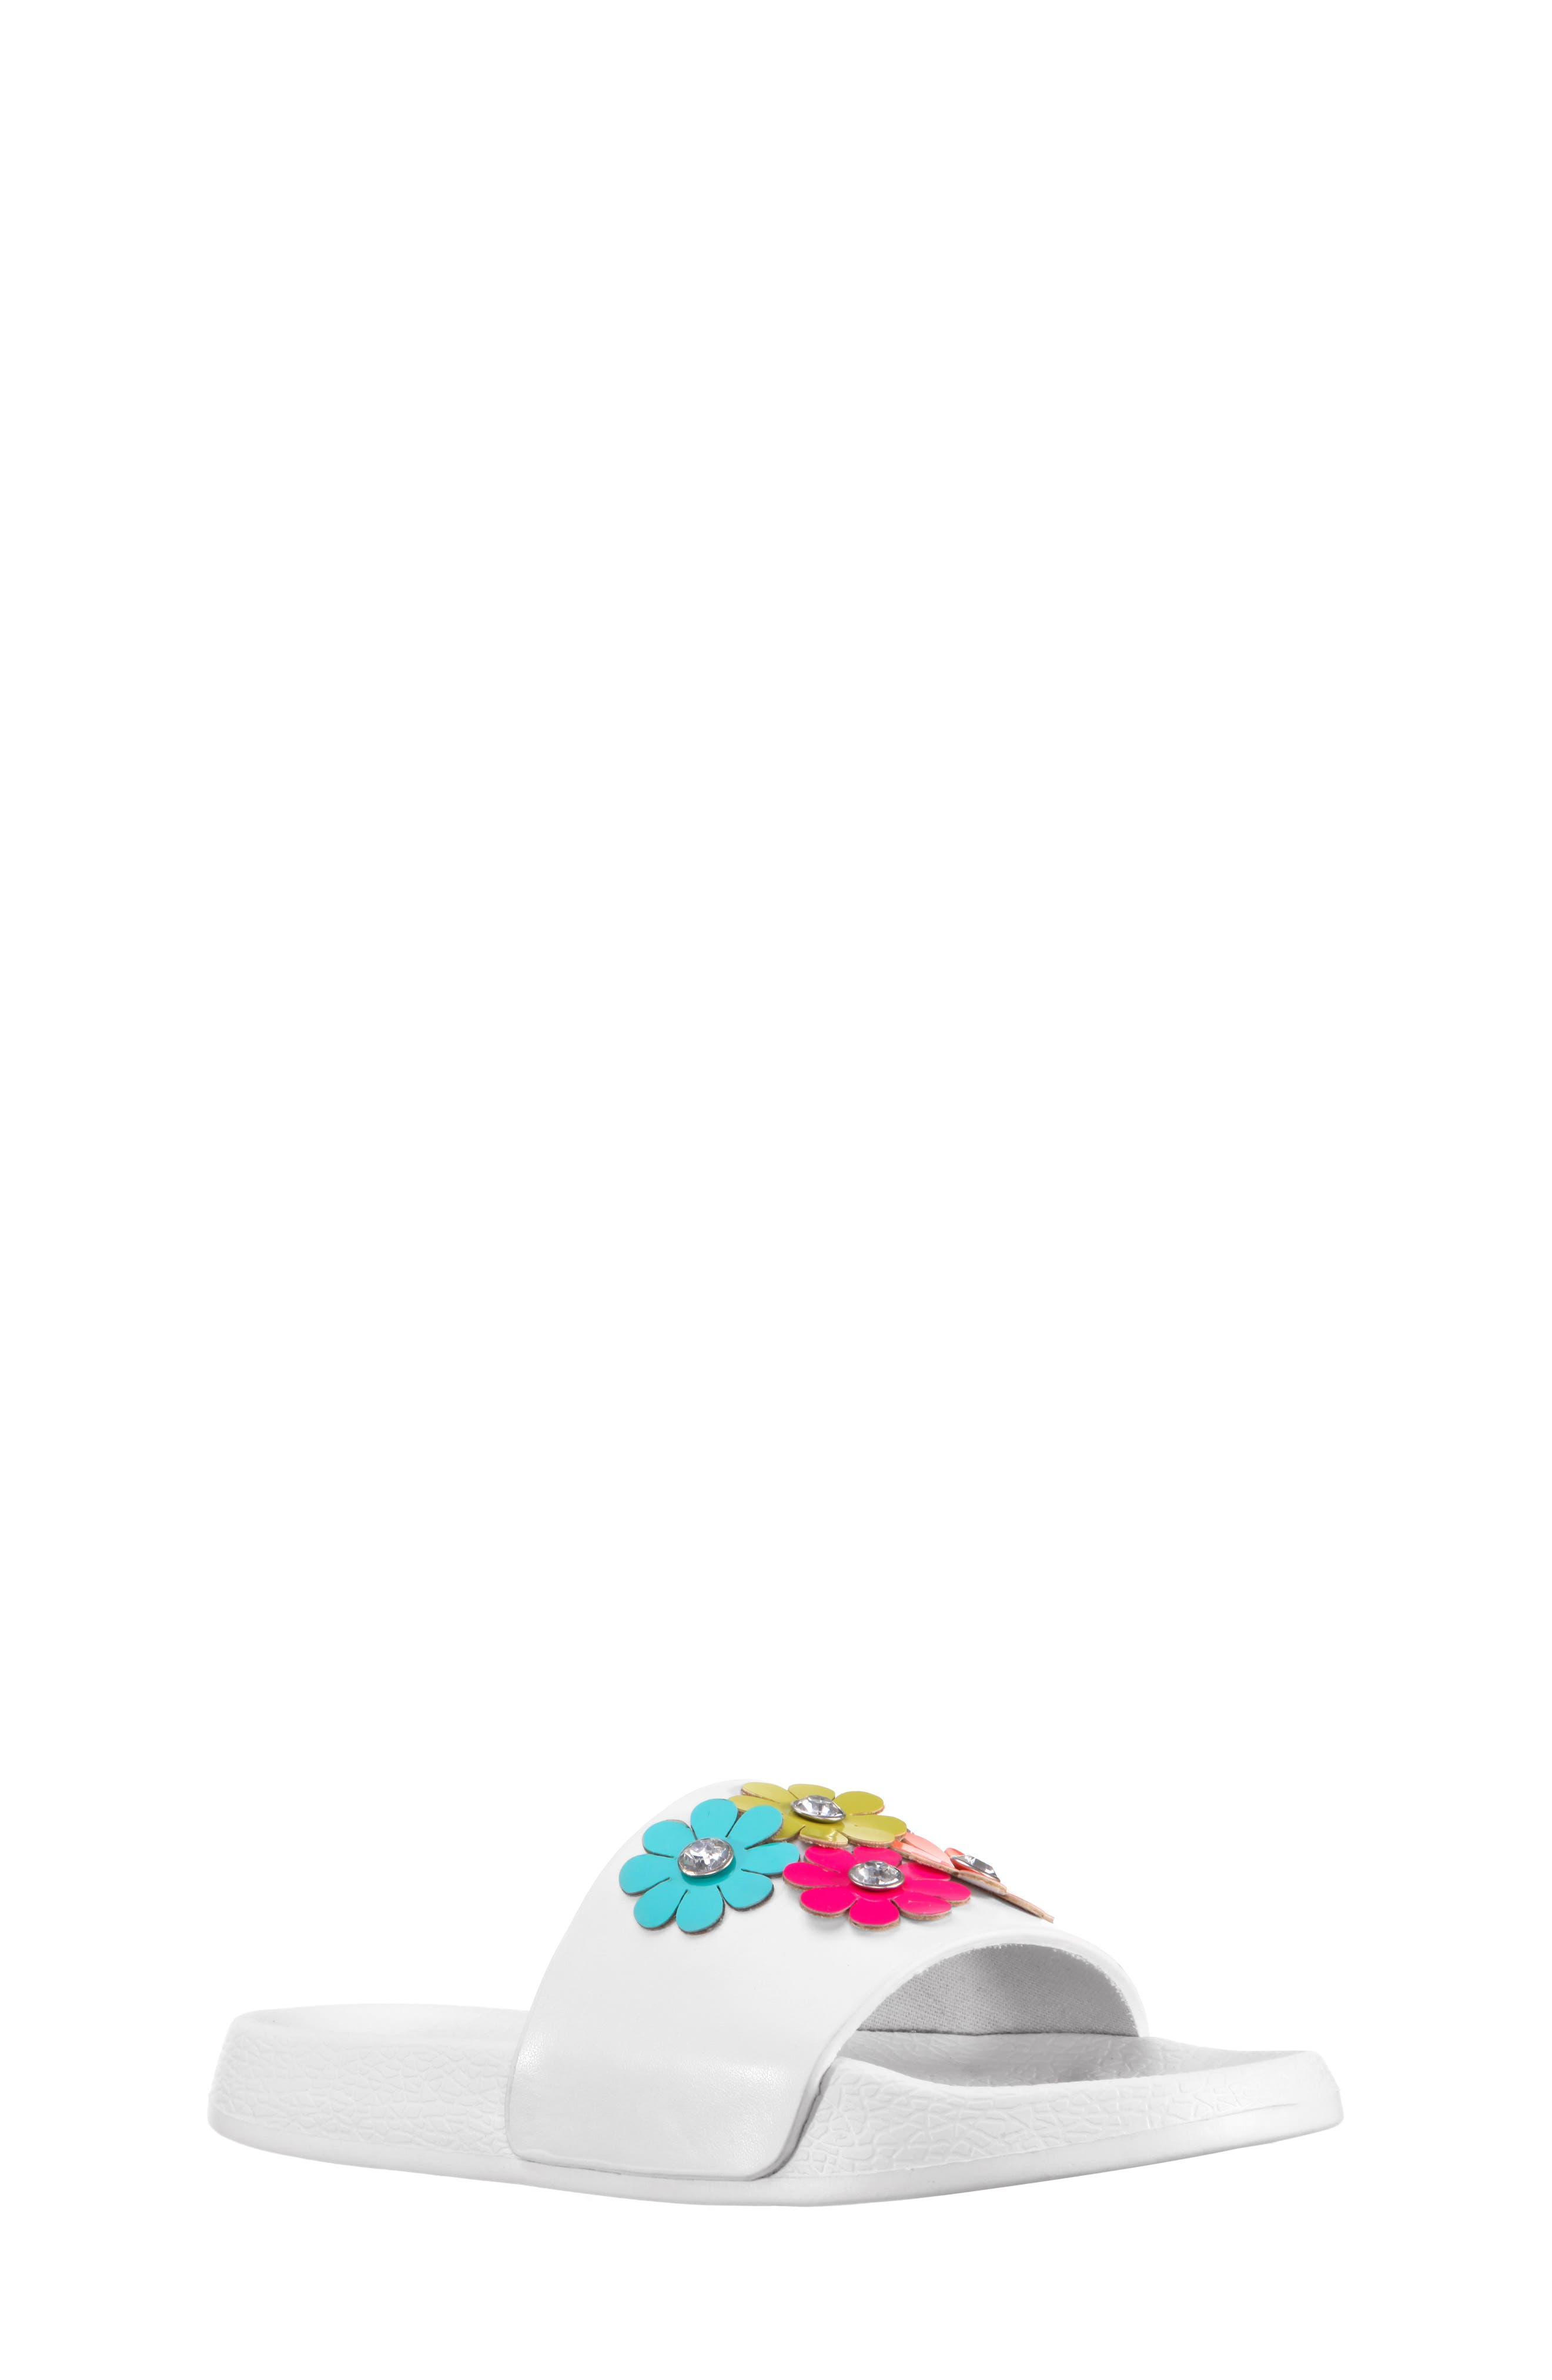 Flowermaid Embellished Slide Sandal,                             Main thumbnail 1, color,                             112